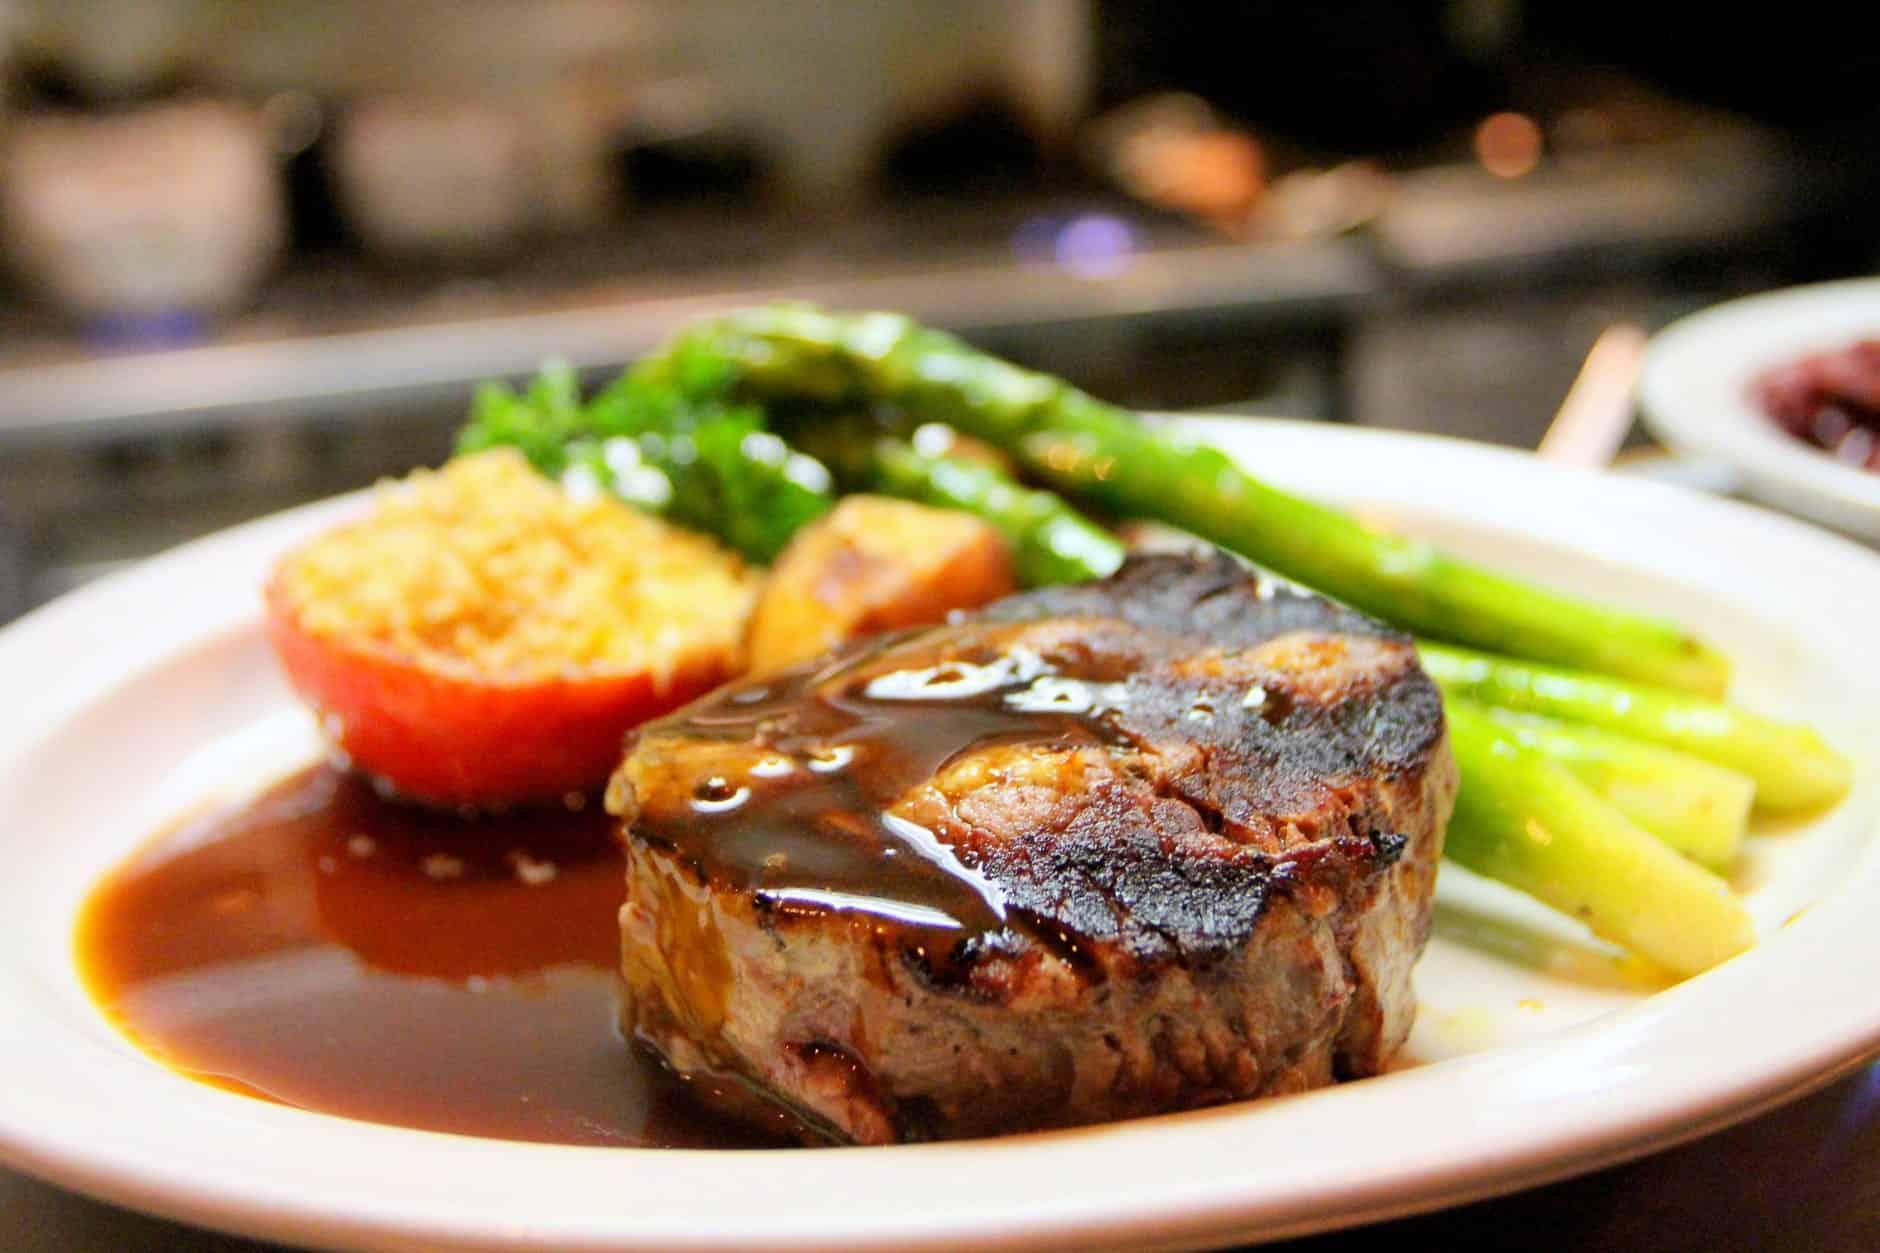 steak and vegetables keto travel hacks